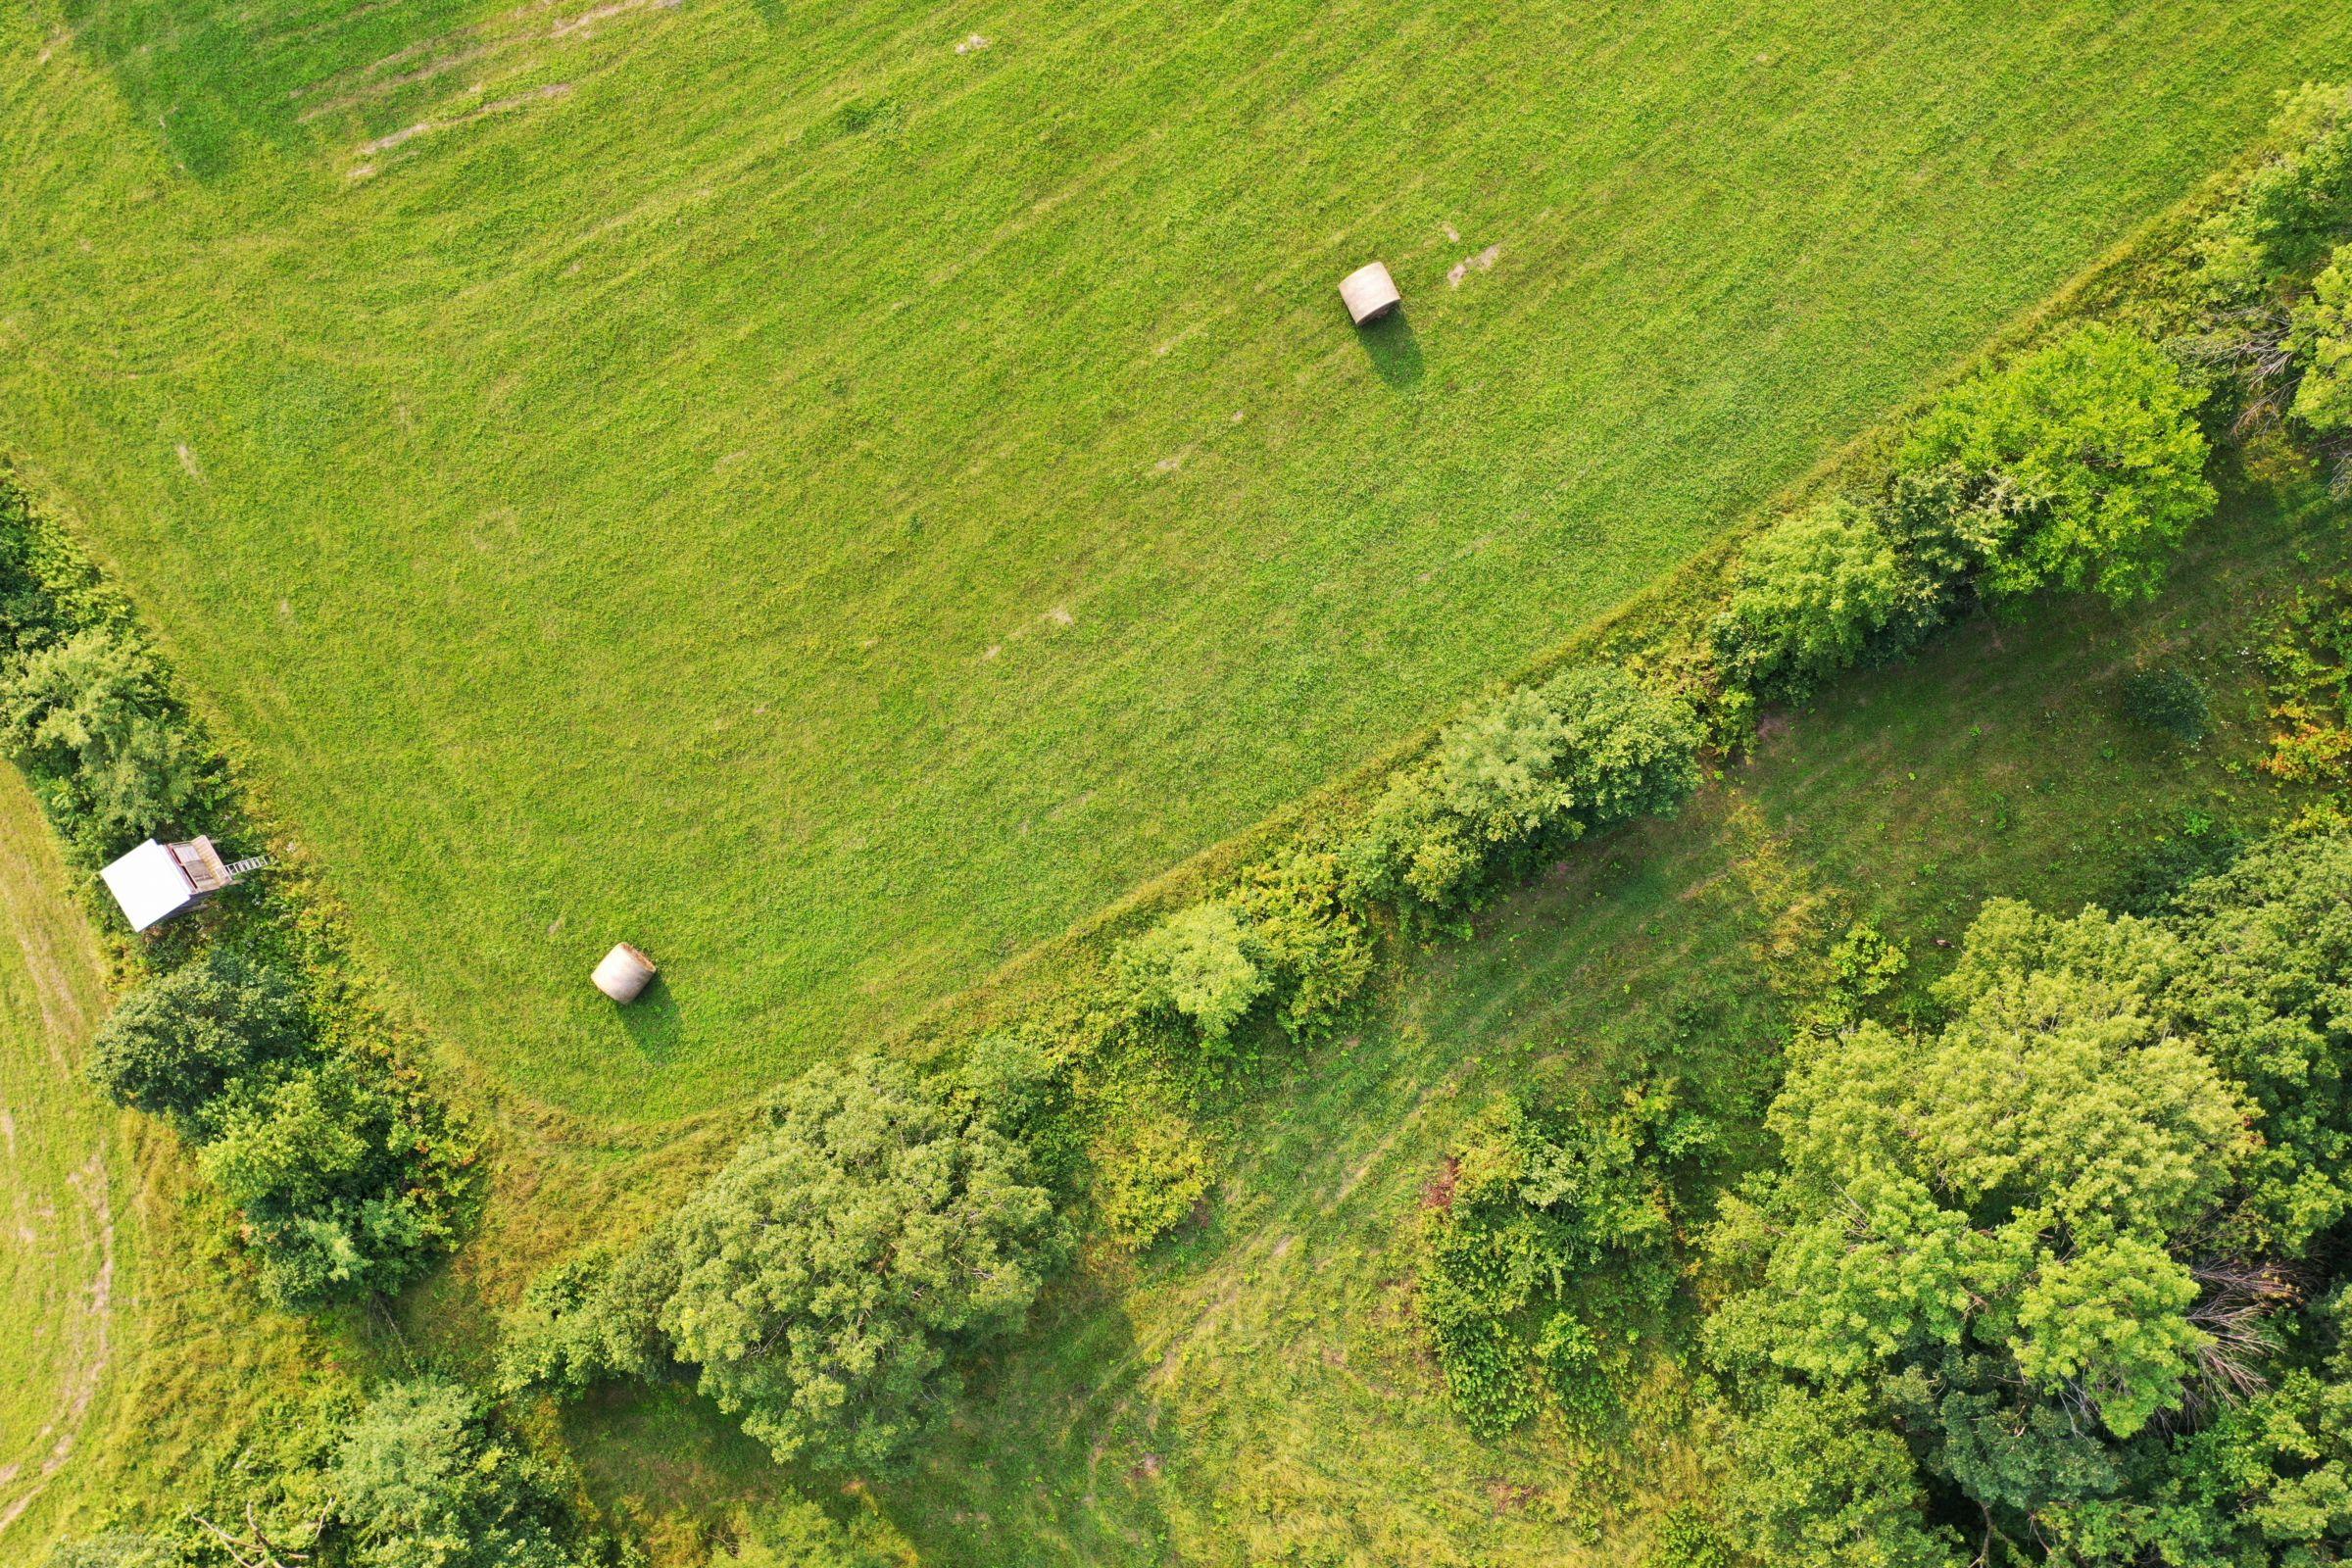 land-lee-county-iowa-340-acres-listing-number-15649-1-2021-07-21-185905.jpg